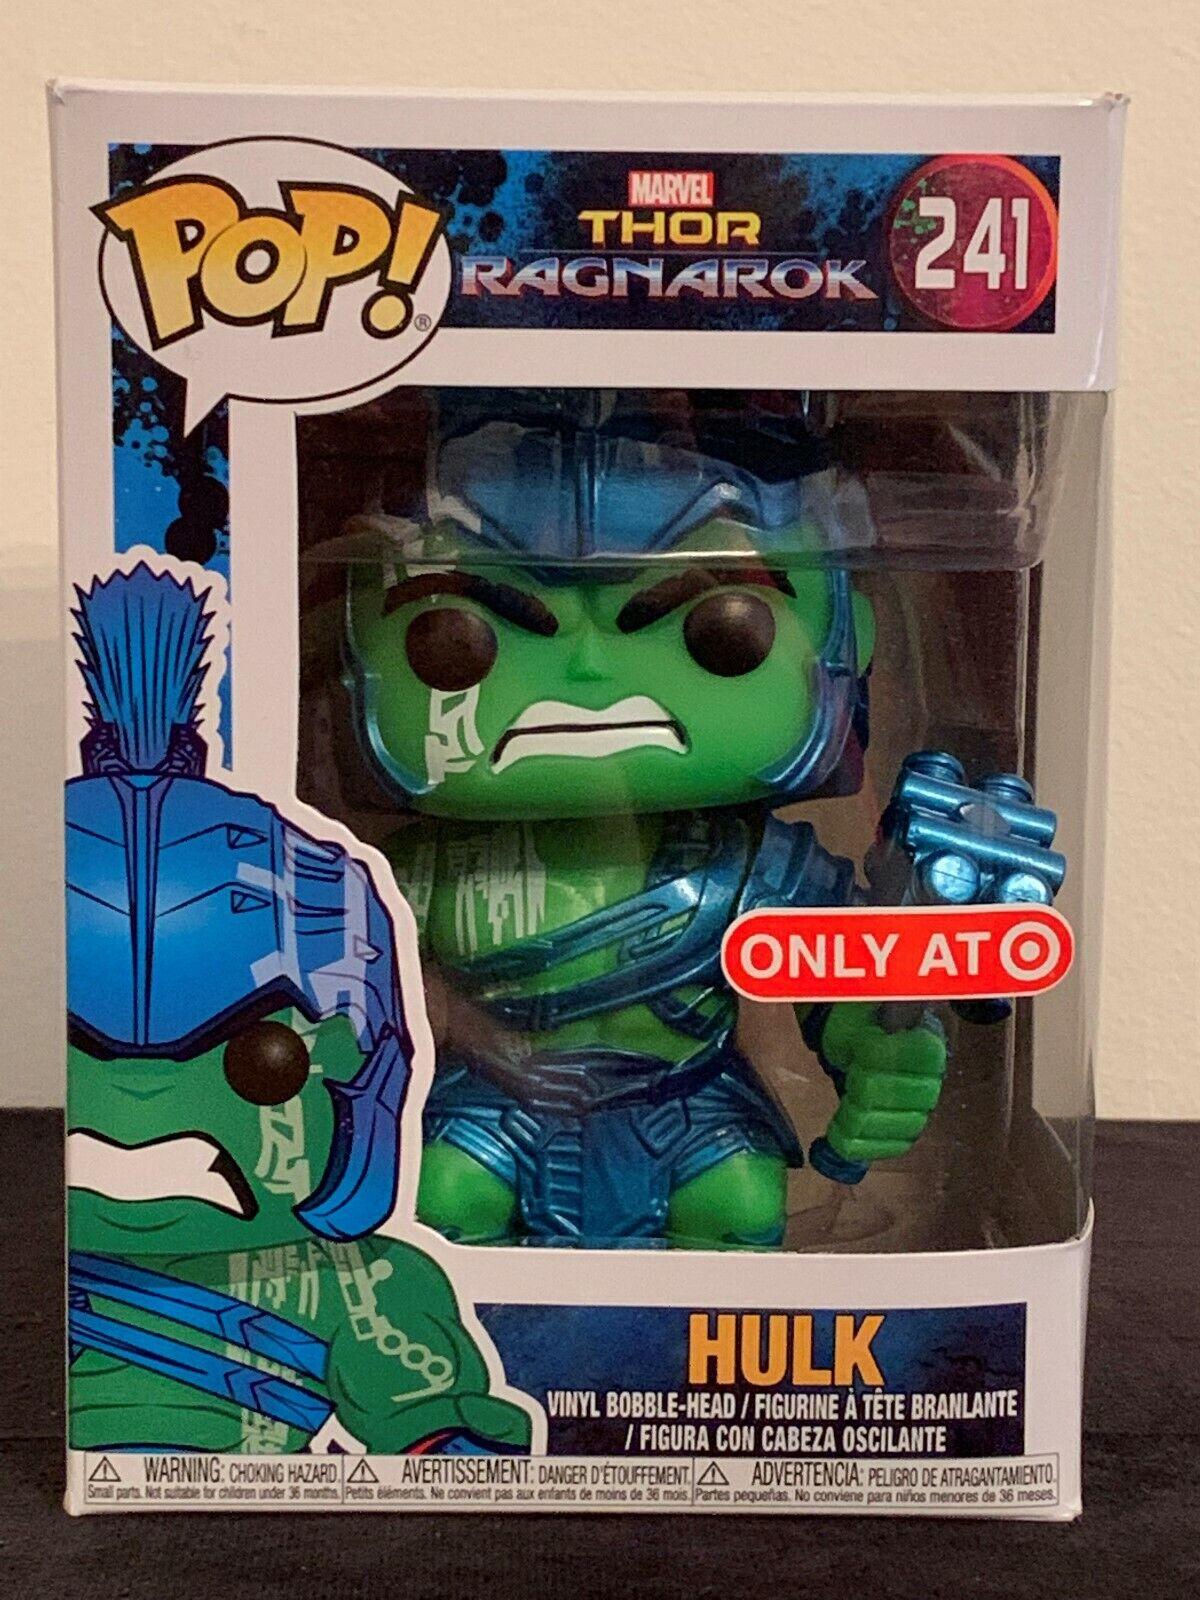 Ragnarök Gladiator Hulk 241# Vinyl Action Figure Collection Toy Funko Pop Thor